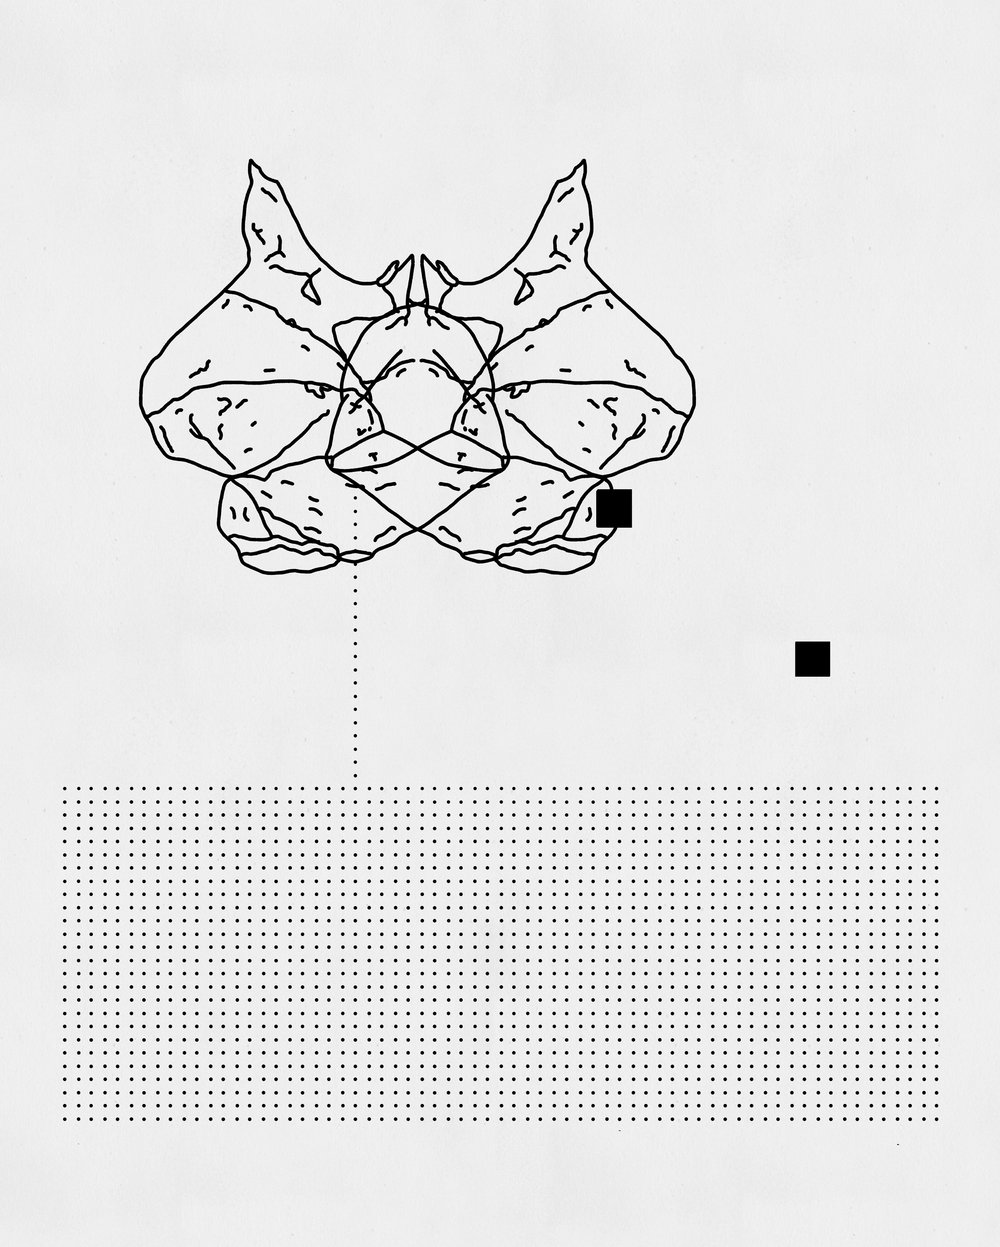 %22Brink%22 - 110 x 100 cm - Fine art print sobre papel - Julián Brangold - 2018.jpg